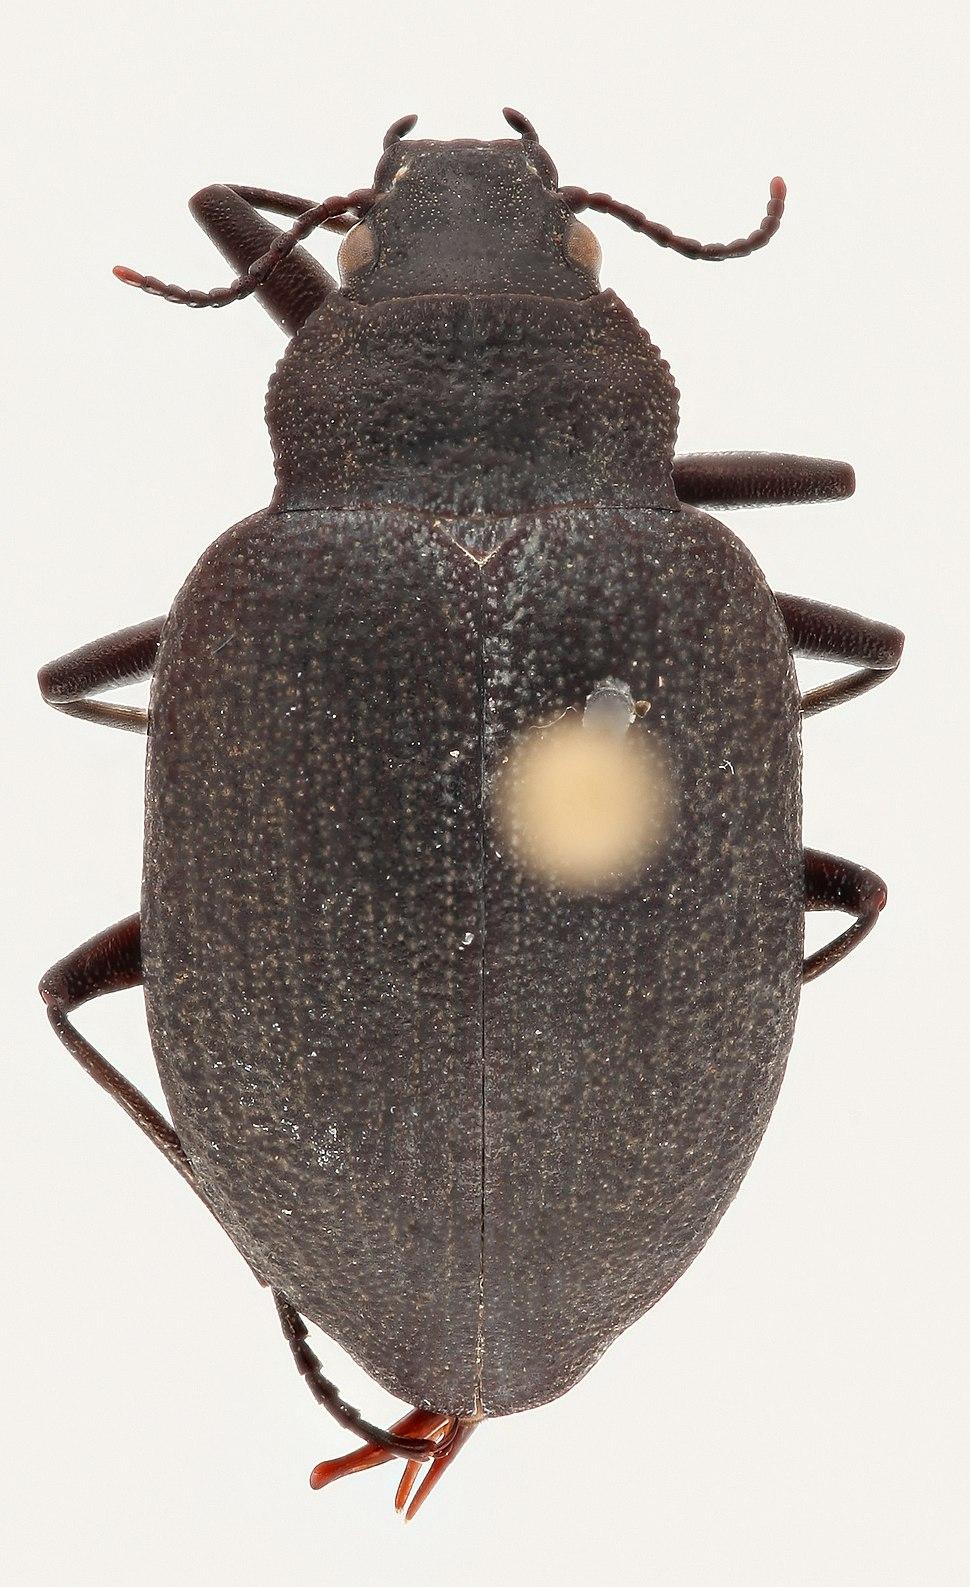 Dorsal Amphizoa insolens